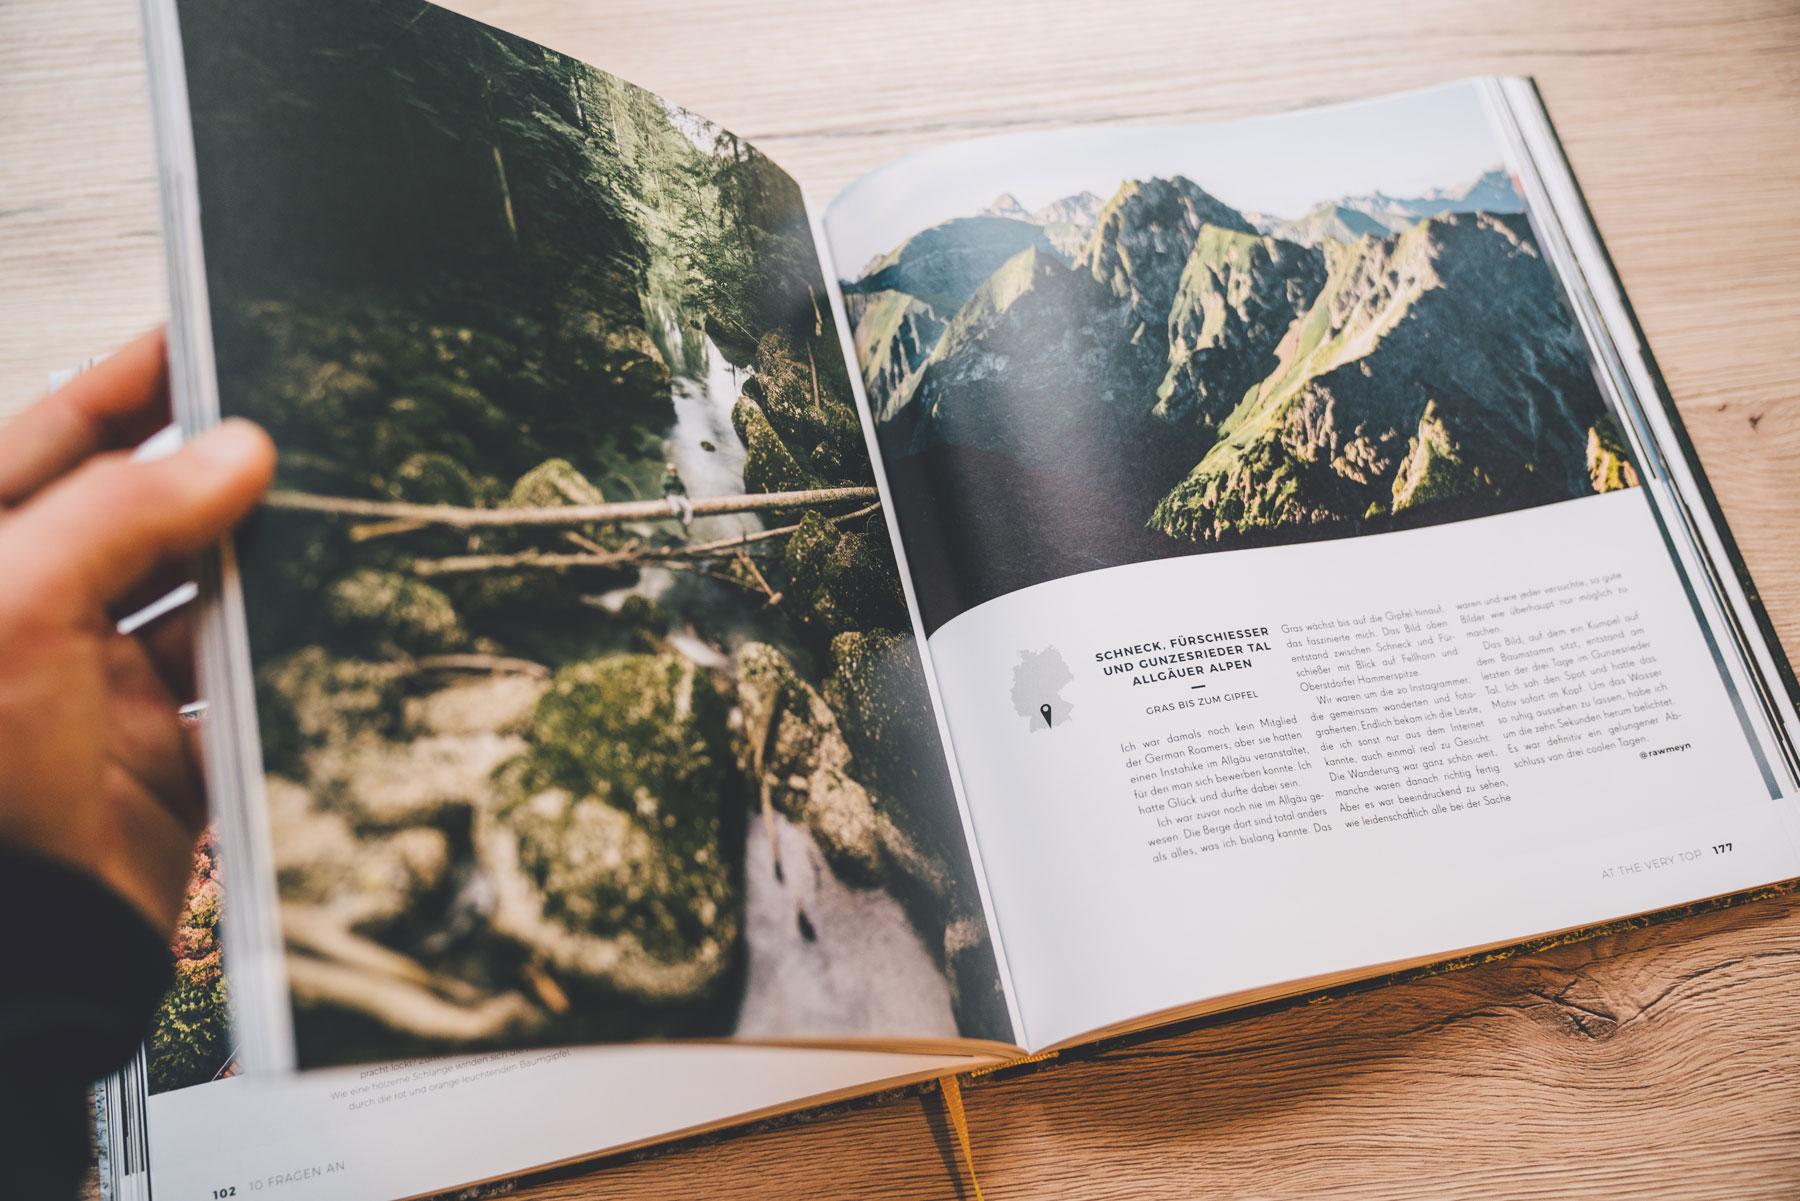 RomanKoenigshofer_Germanroamers_Book_Photographer_Outdoor_DSC04774